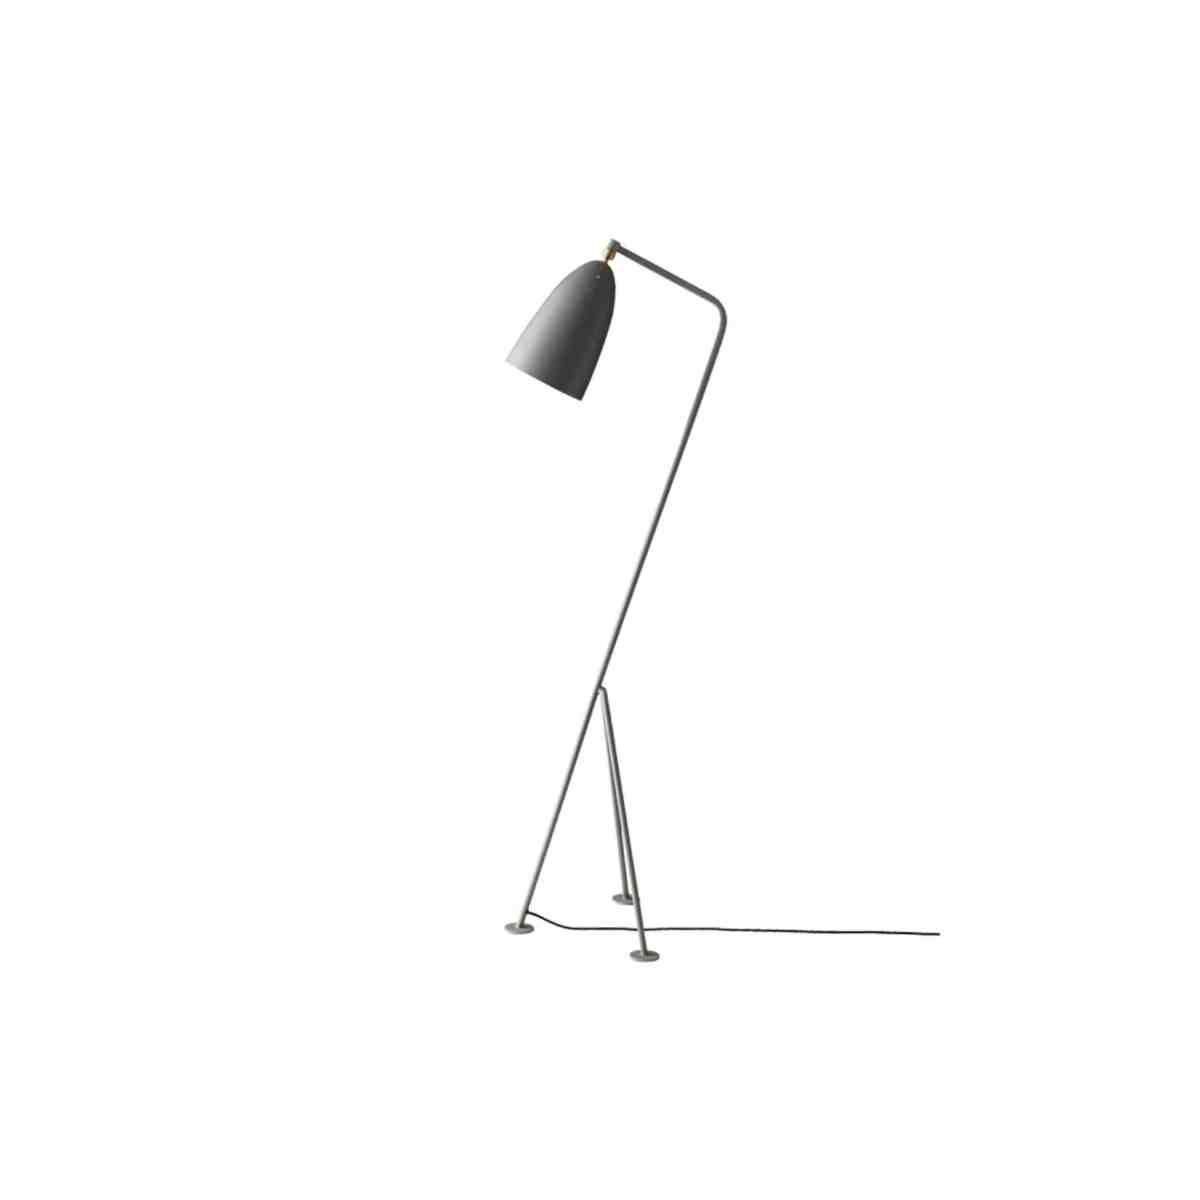 gubi-grashoppa-floor-lamp-blue-grey-001